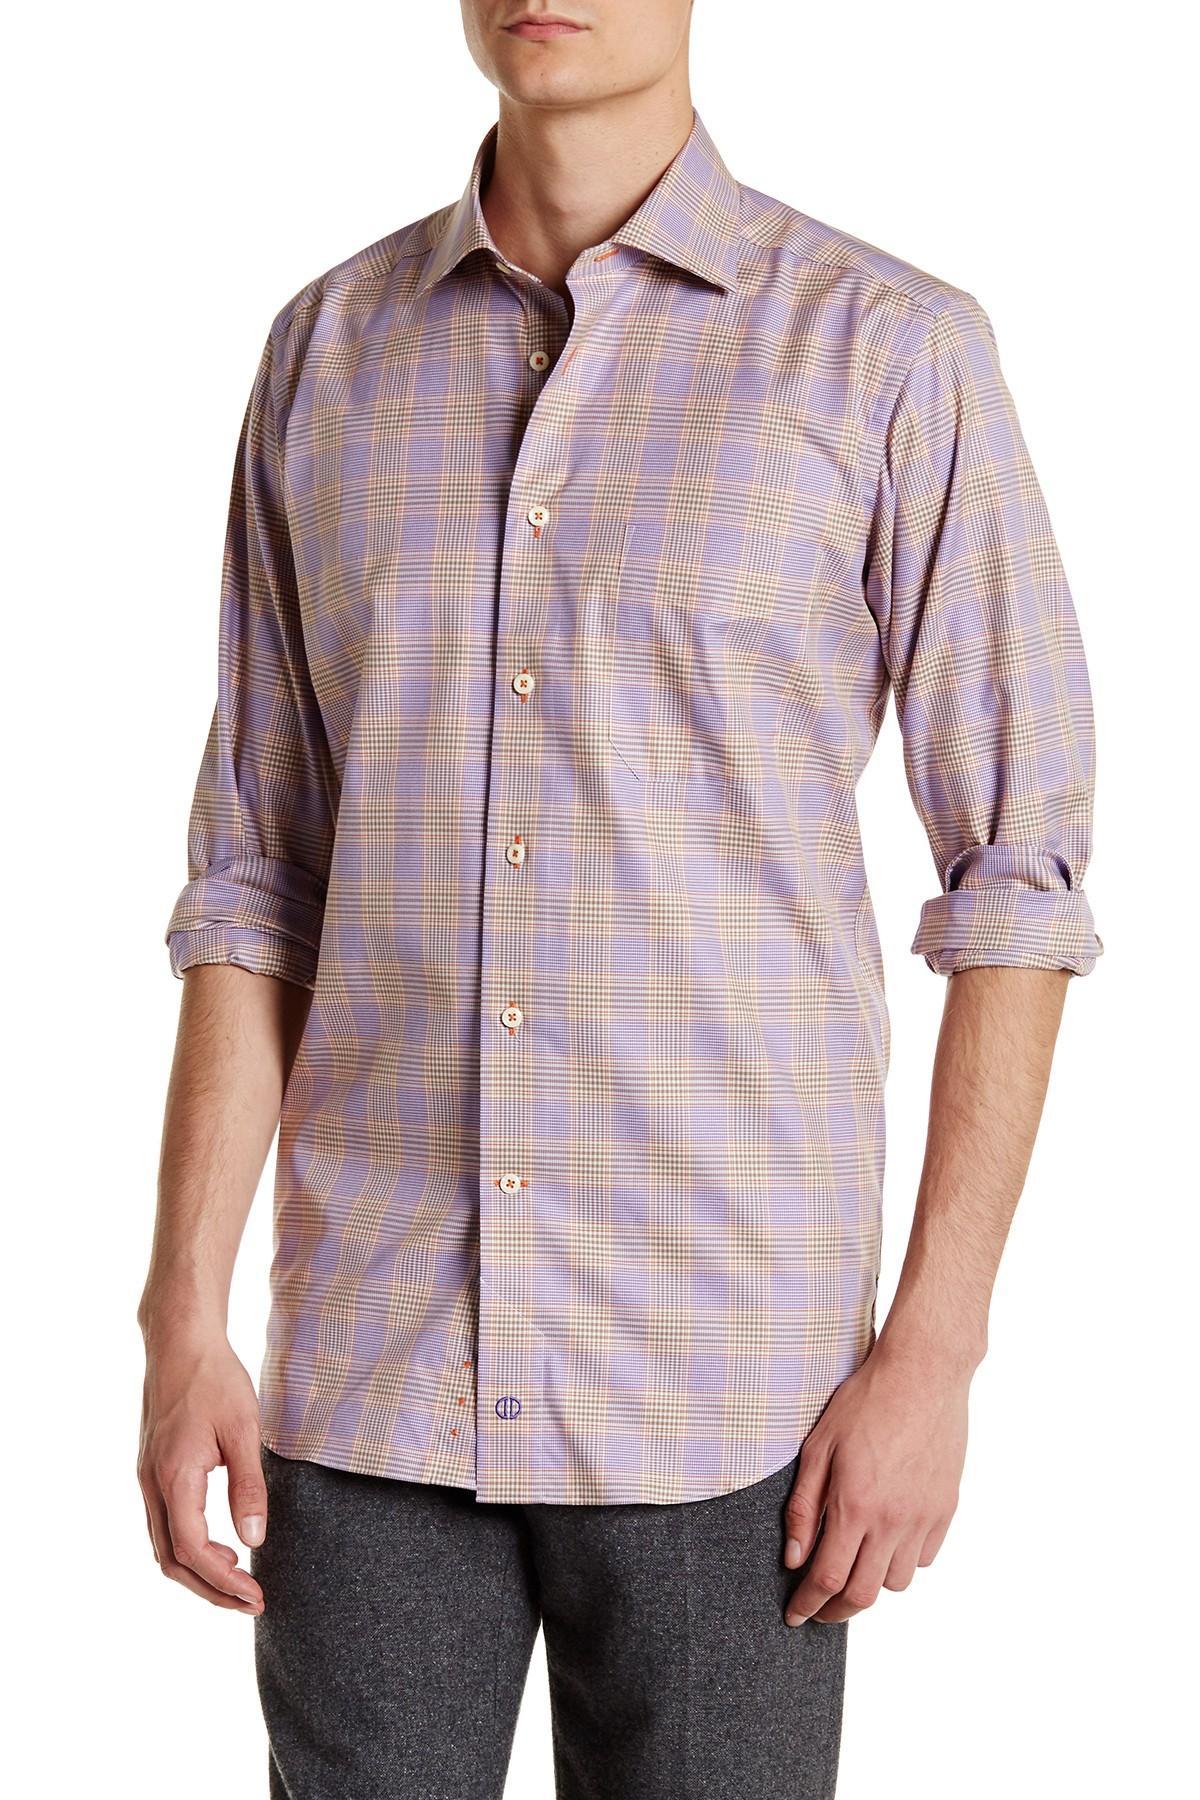 David Donahue Plaid Regular Fit Shirt In Purple For Men Lyst